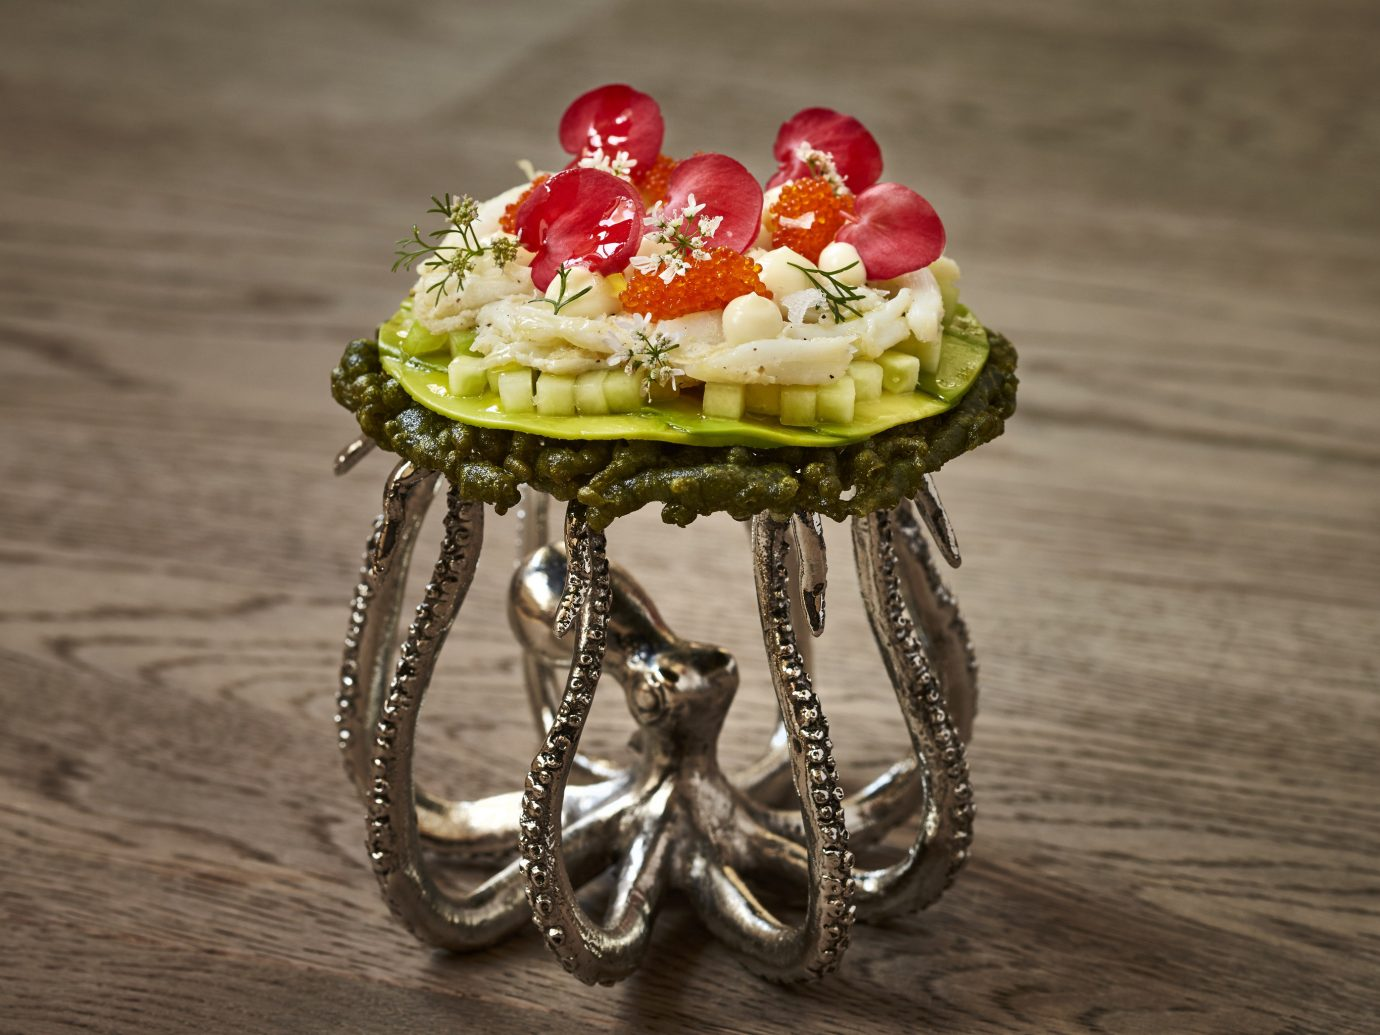 Trip Ideas ground floor jewellery green fashion accessory flower ring earrings macro photography food